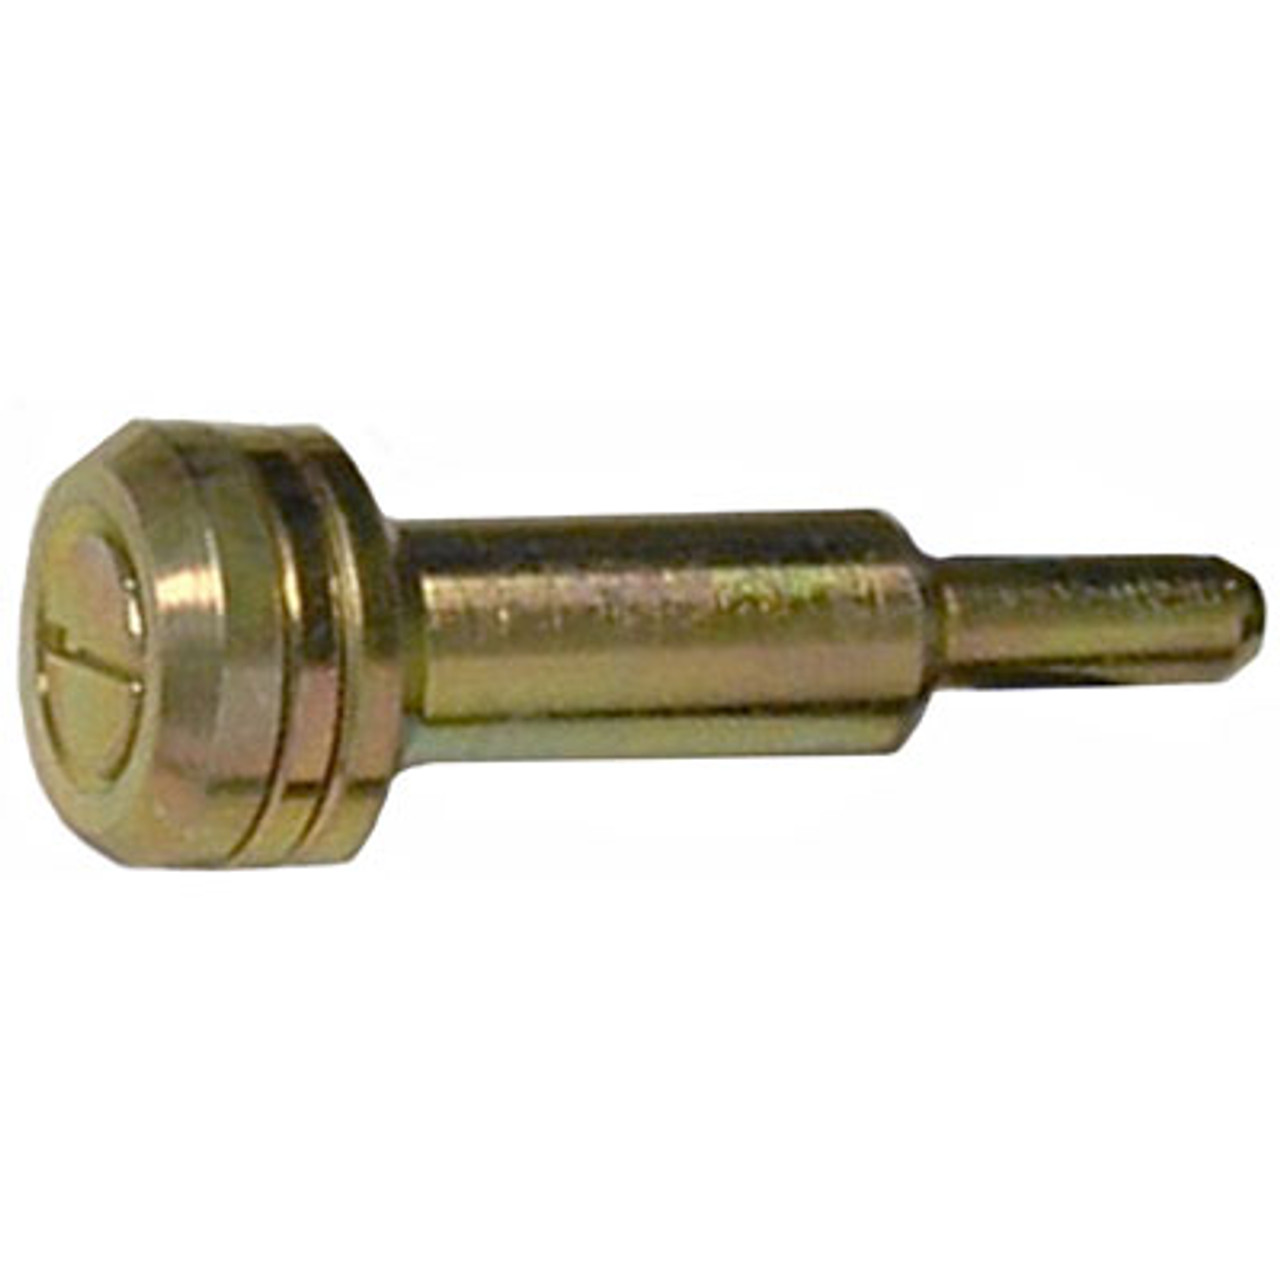 "SG Tool Aid 94860 Cut-Off Wheels 3/"" x 1//16/"" x 3//8/"" Hole-5 per Display Card"